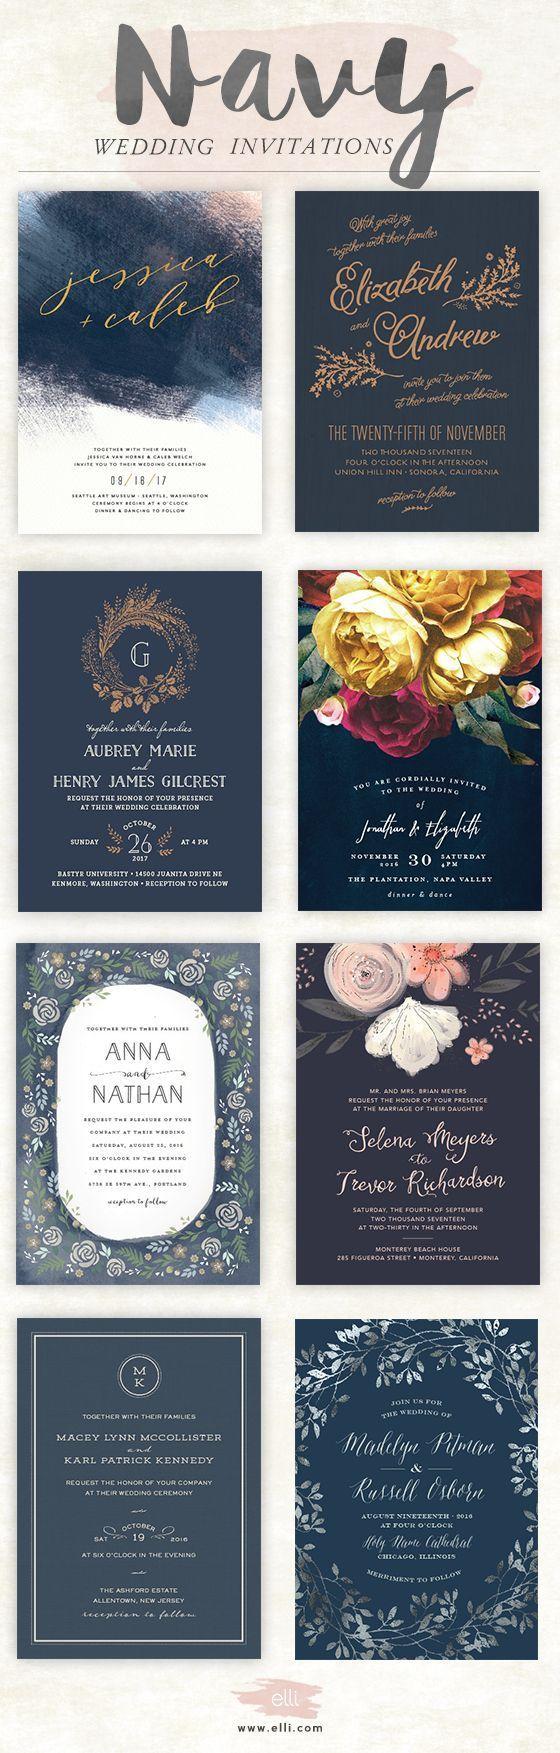 sample spanish wedding invitations%0A Now trending  navy wedding invitations from Elli com